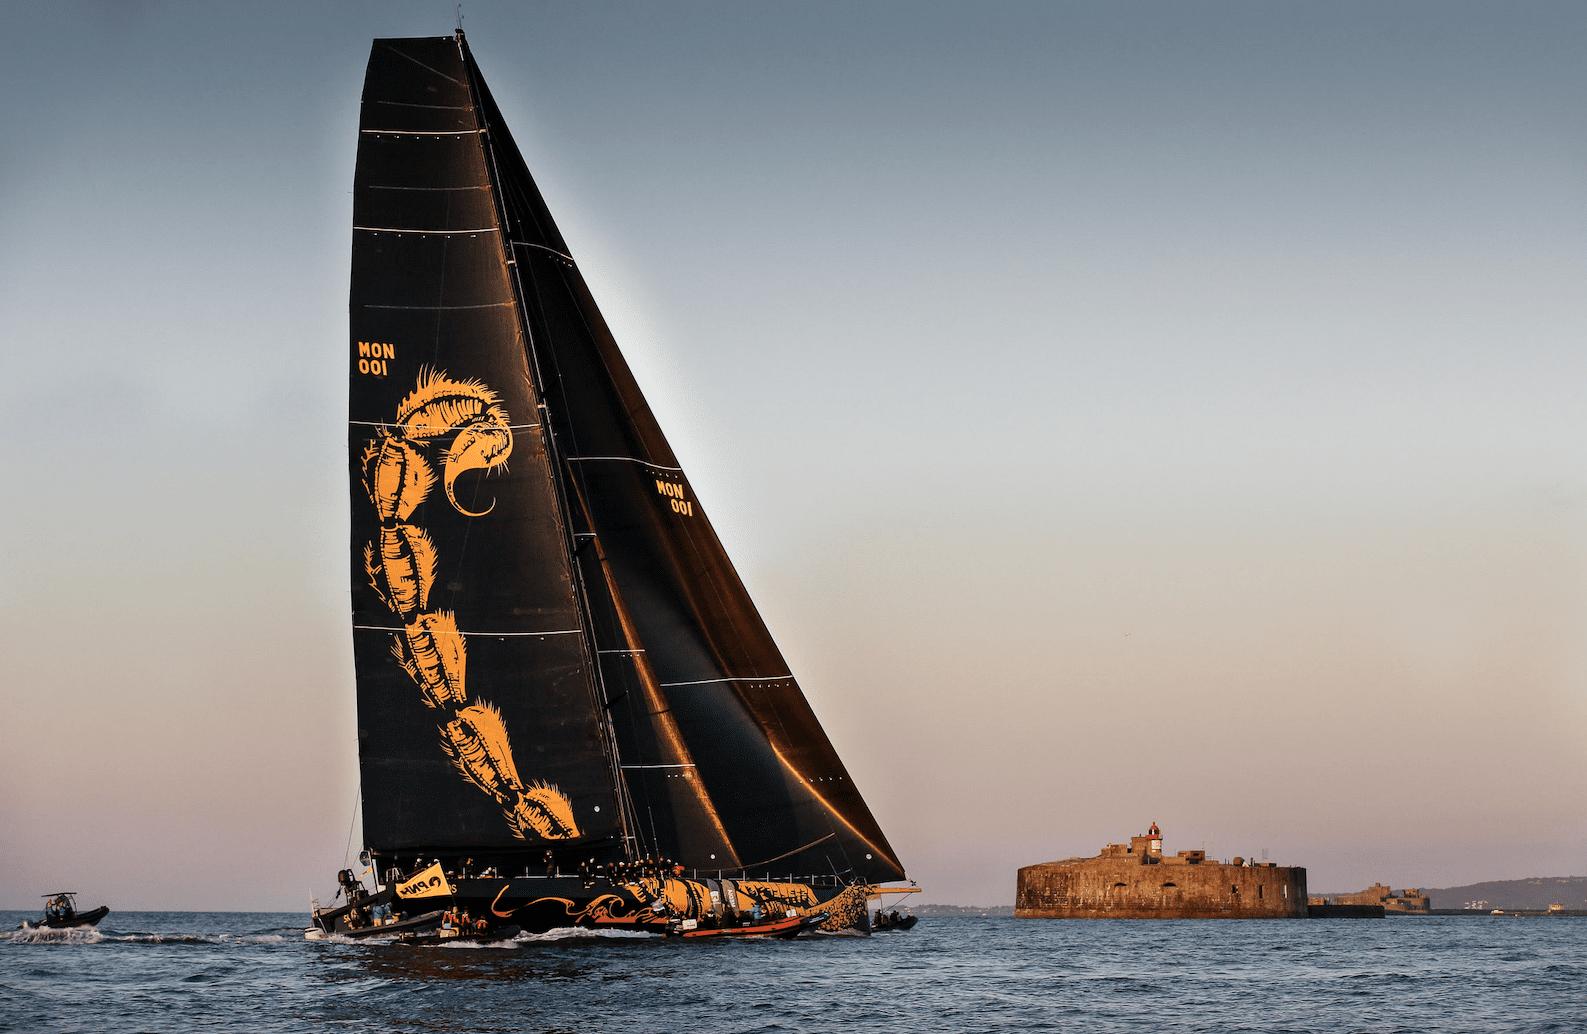 Monaco-flagged yacht wins 49th Rolex Fastnet Race